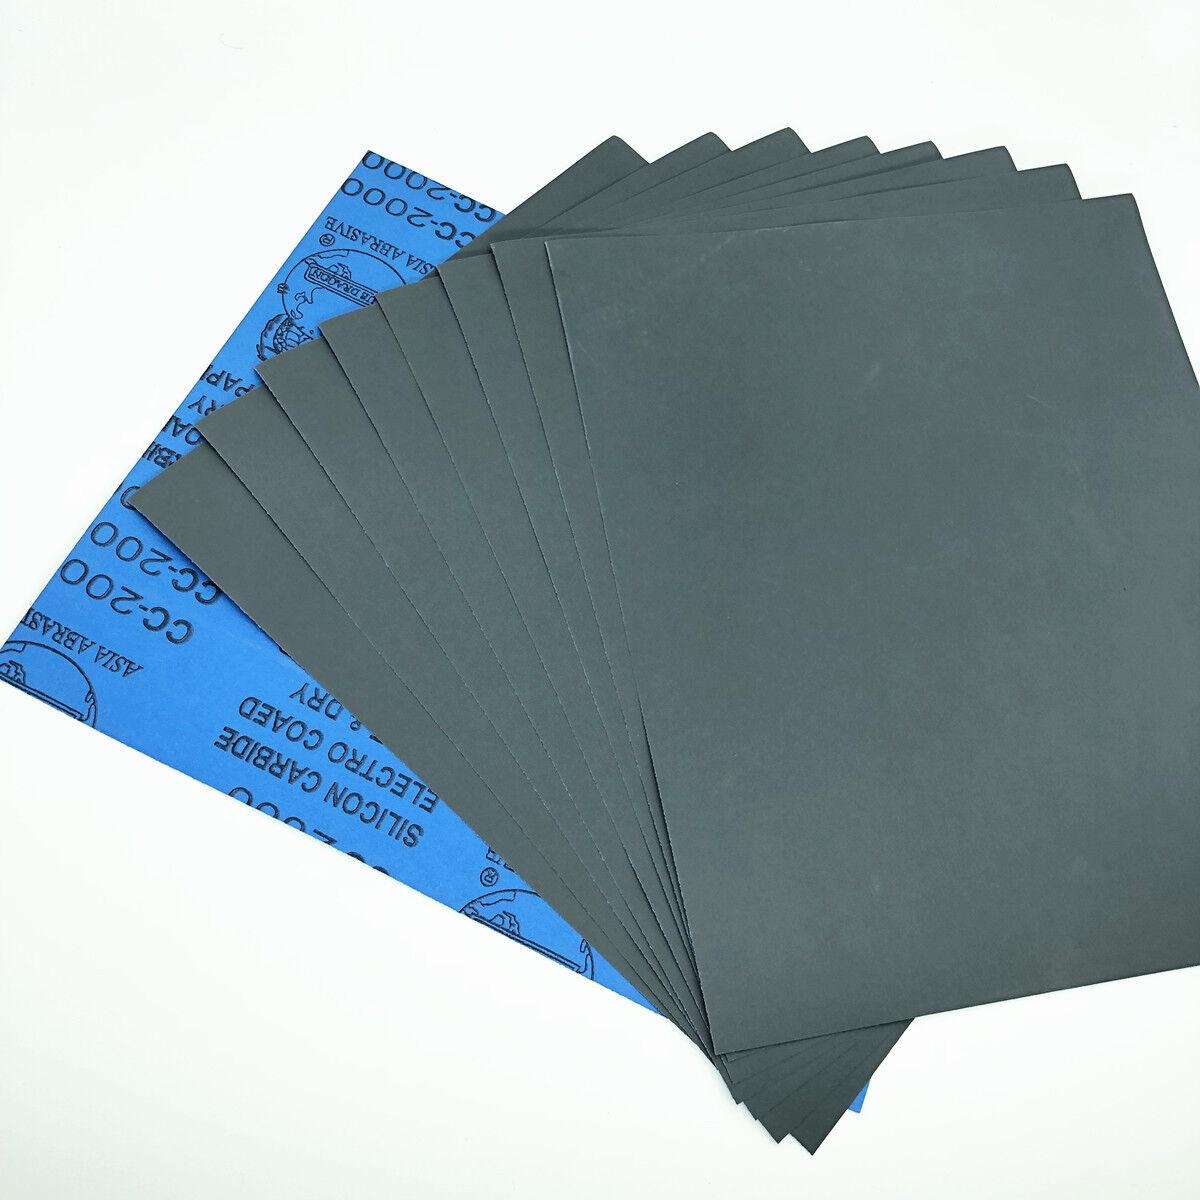 9''x11'' Wet dry Sandpaper Sheets 400/600/800/1000/2000/3000/5000 Grit Polish 2